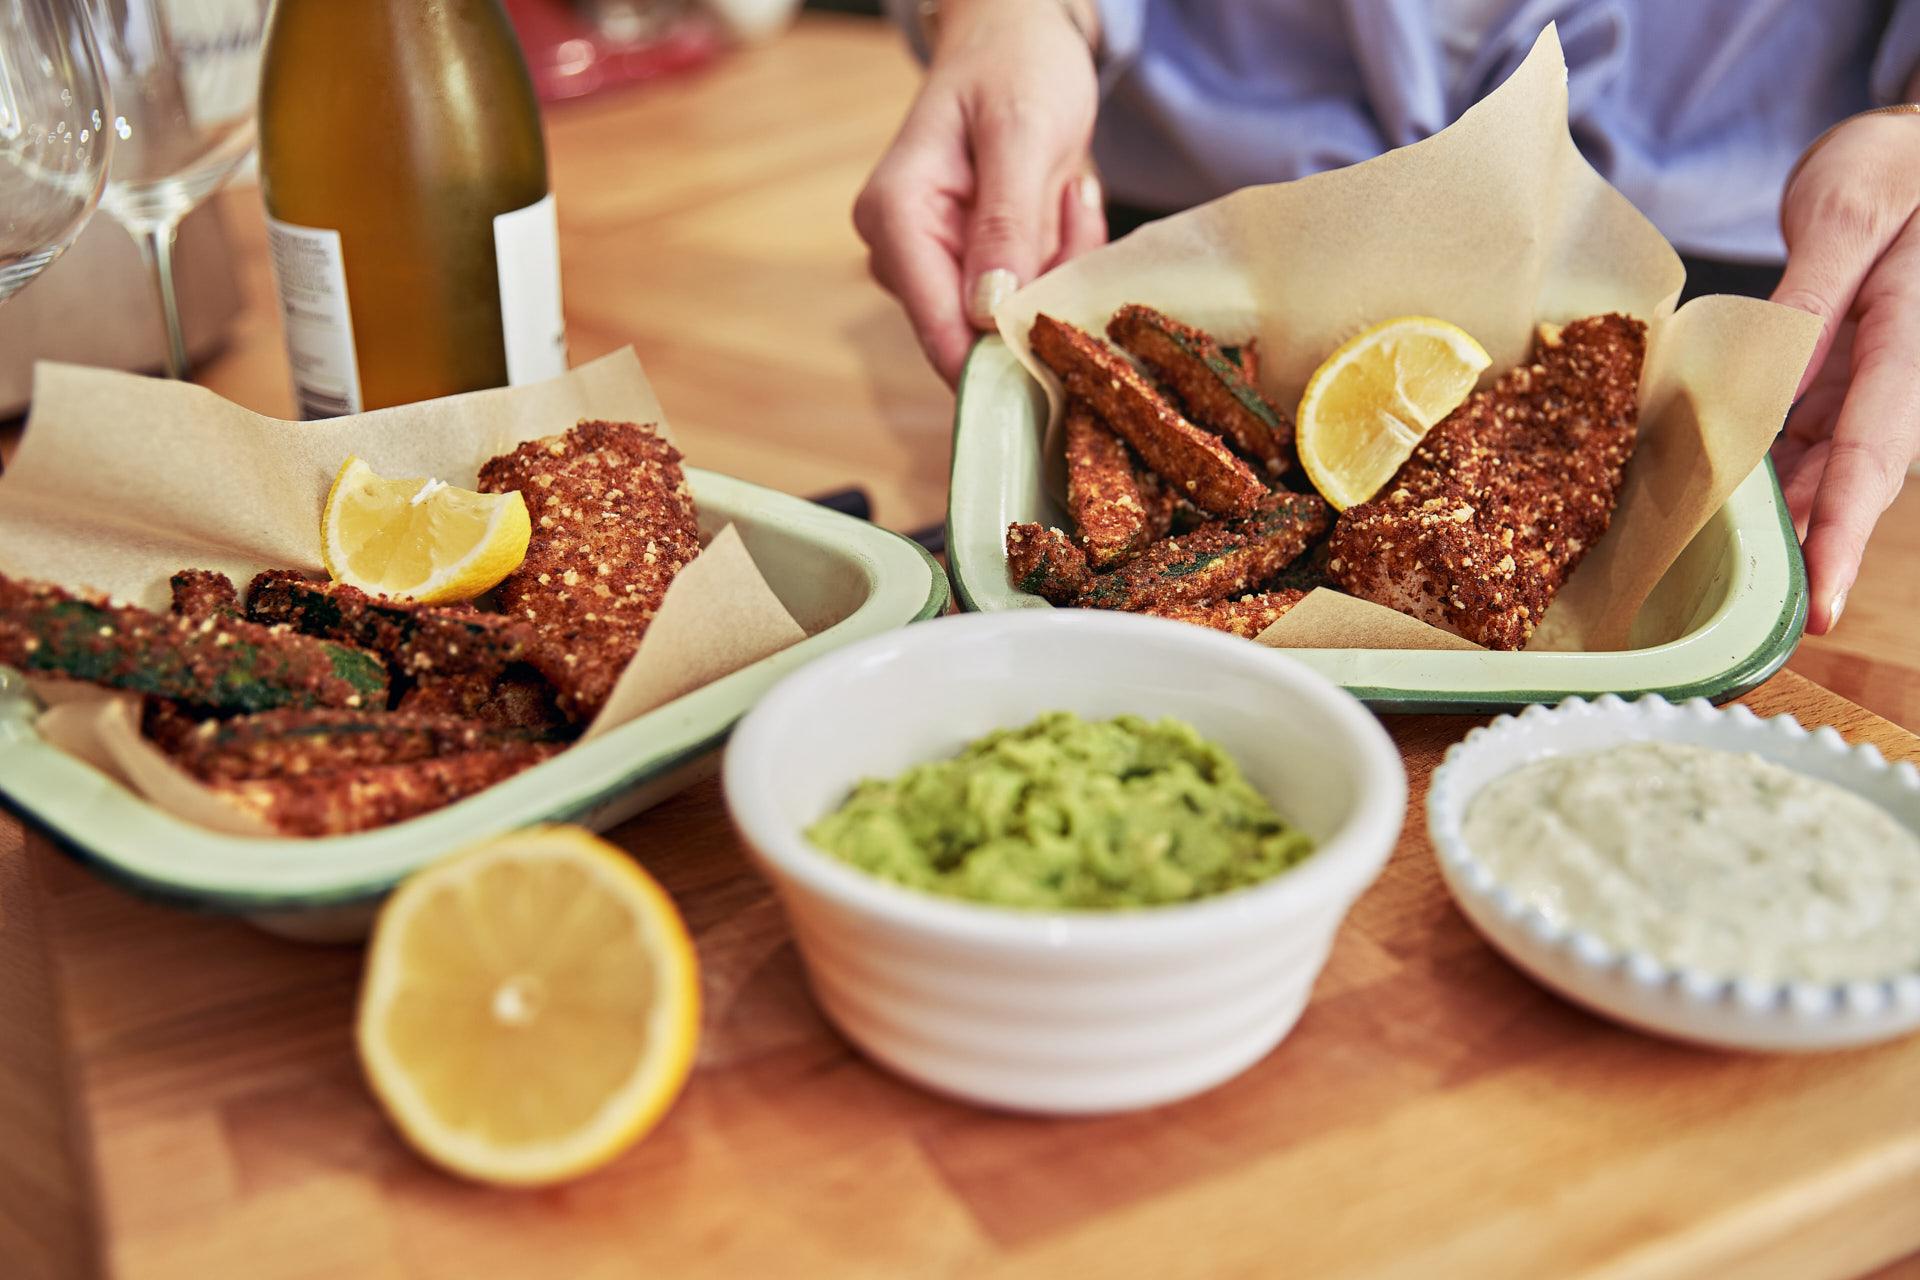 Breaded fish midweek meal